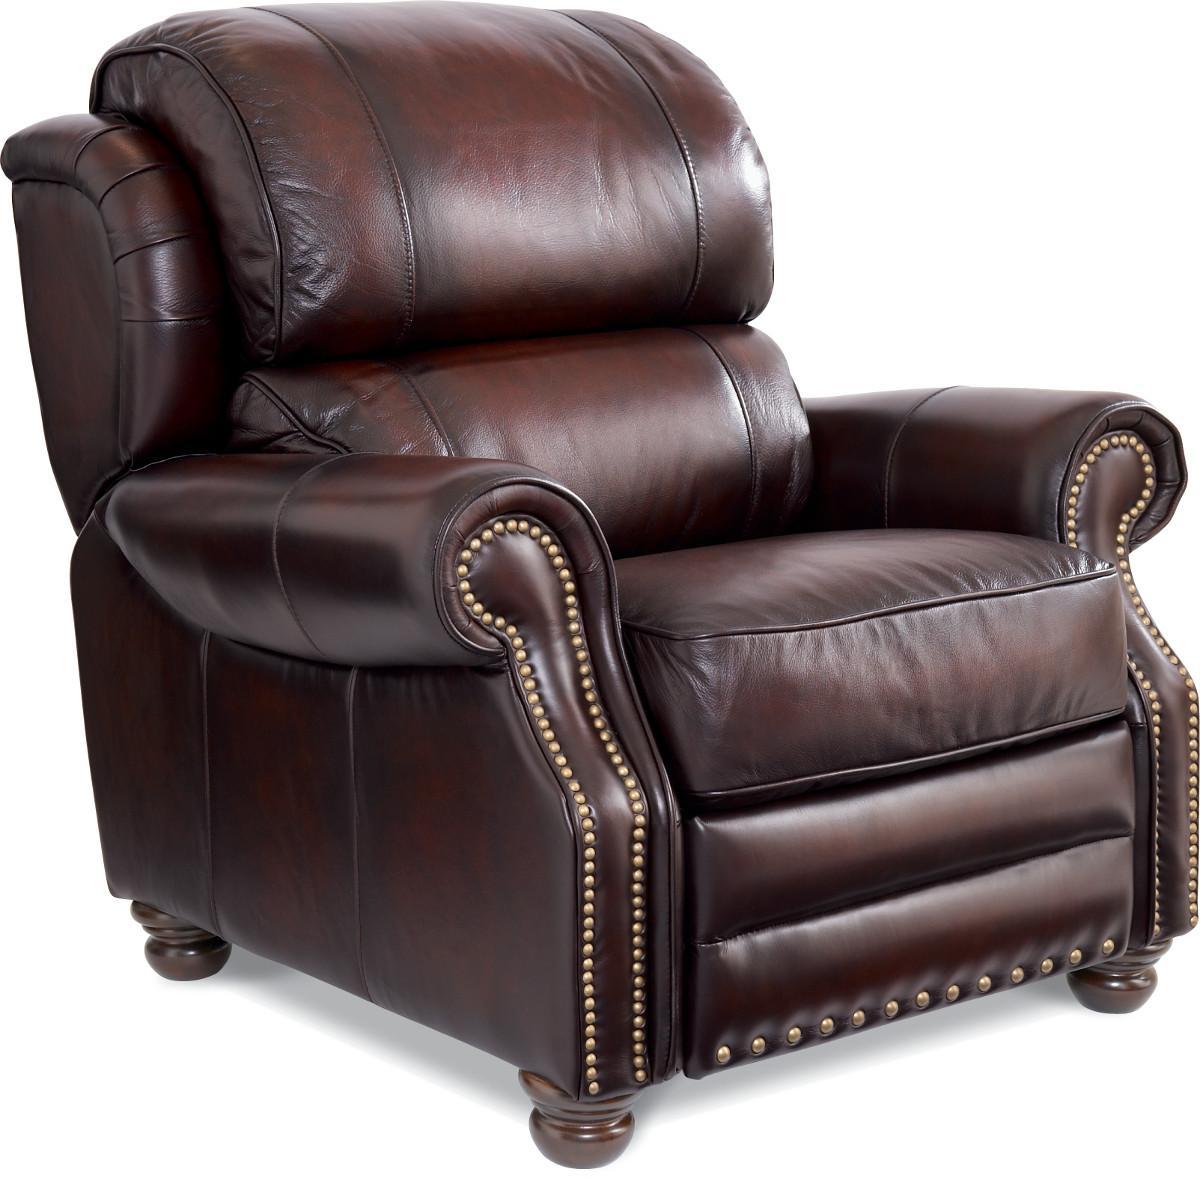 La Z Boy JAMISON Traditional High Leg Leather Recliner  : products2Fla z boy2Fcolor2Fjamison20 201445605977729800lg992909 b0 from www.zaksfurniture.com size 1200 x 1178 jpeg 118kB